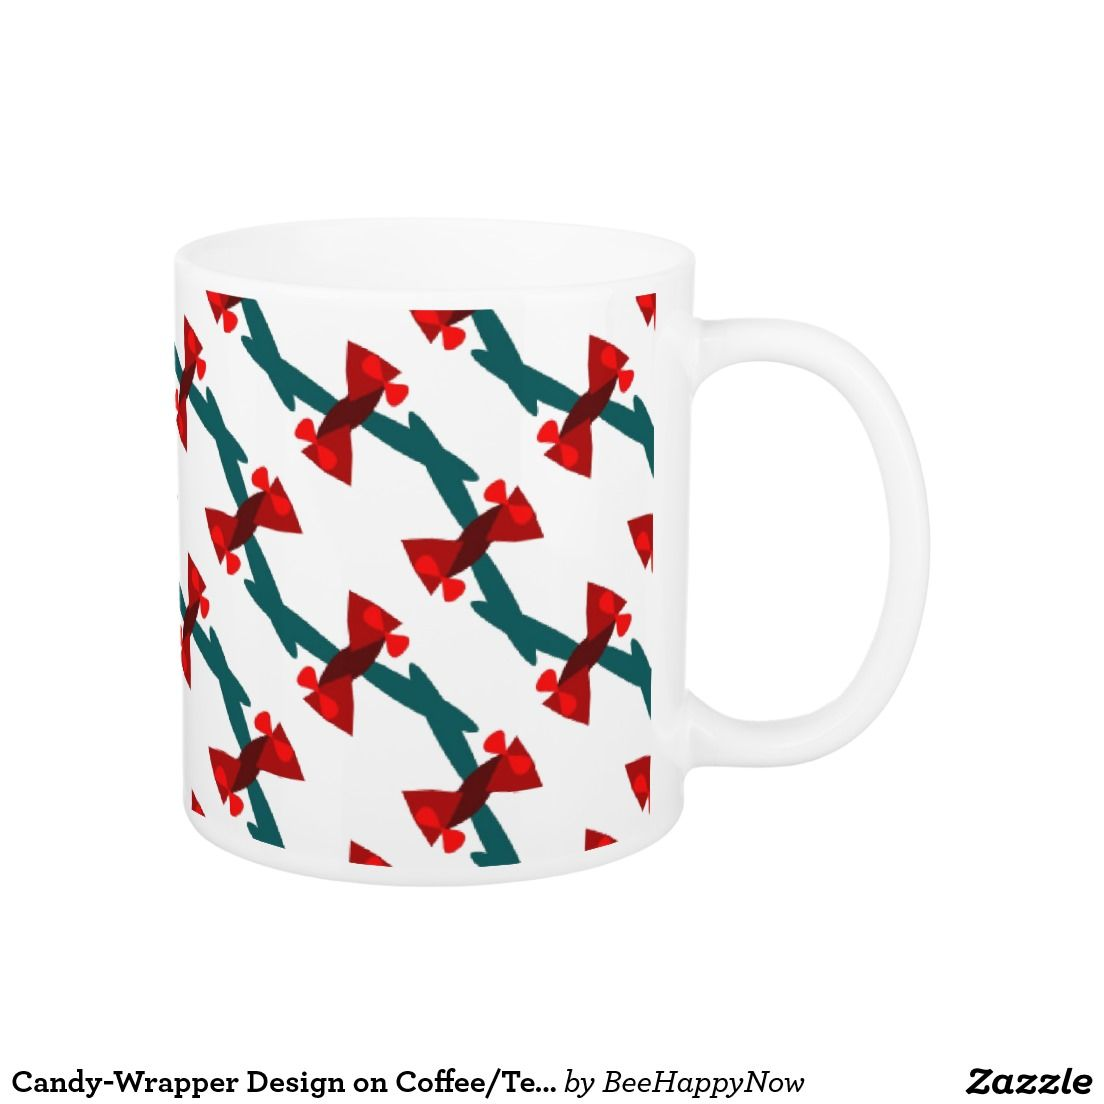 Candy-Wrapper Design on Coffee/Tea Mug